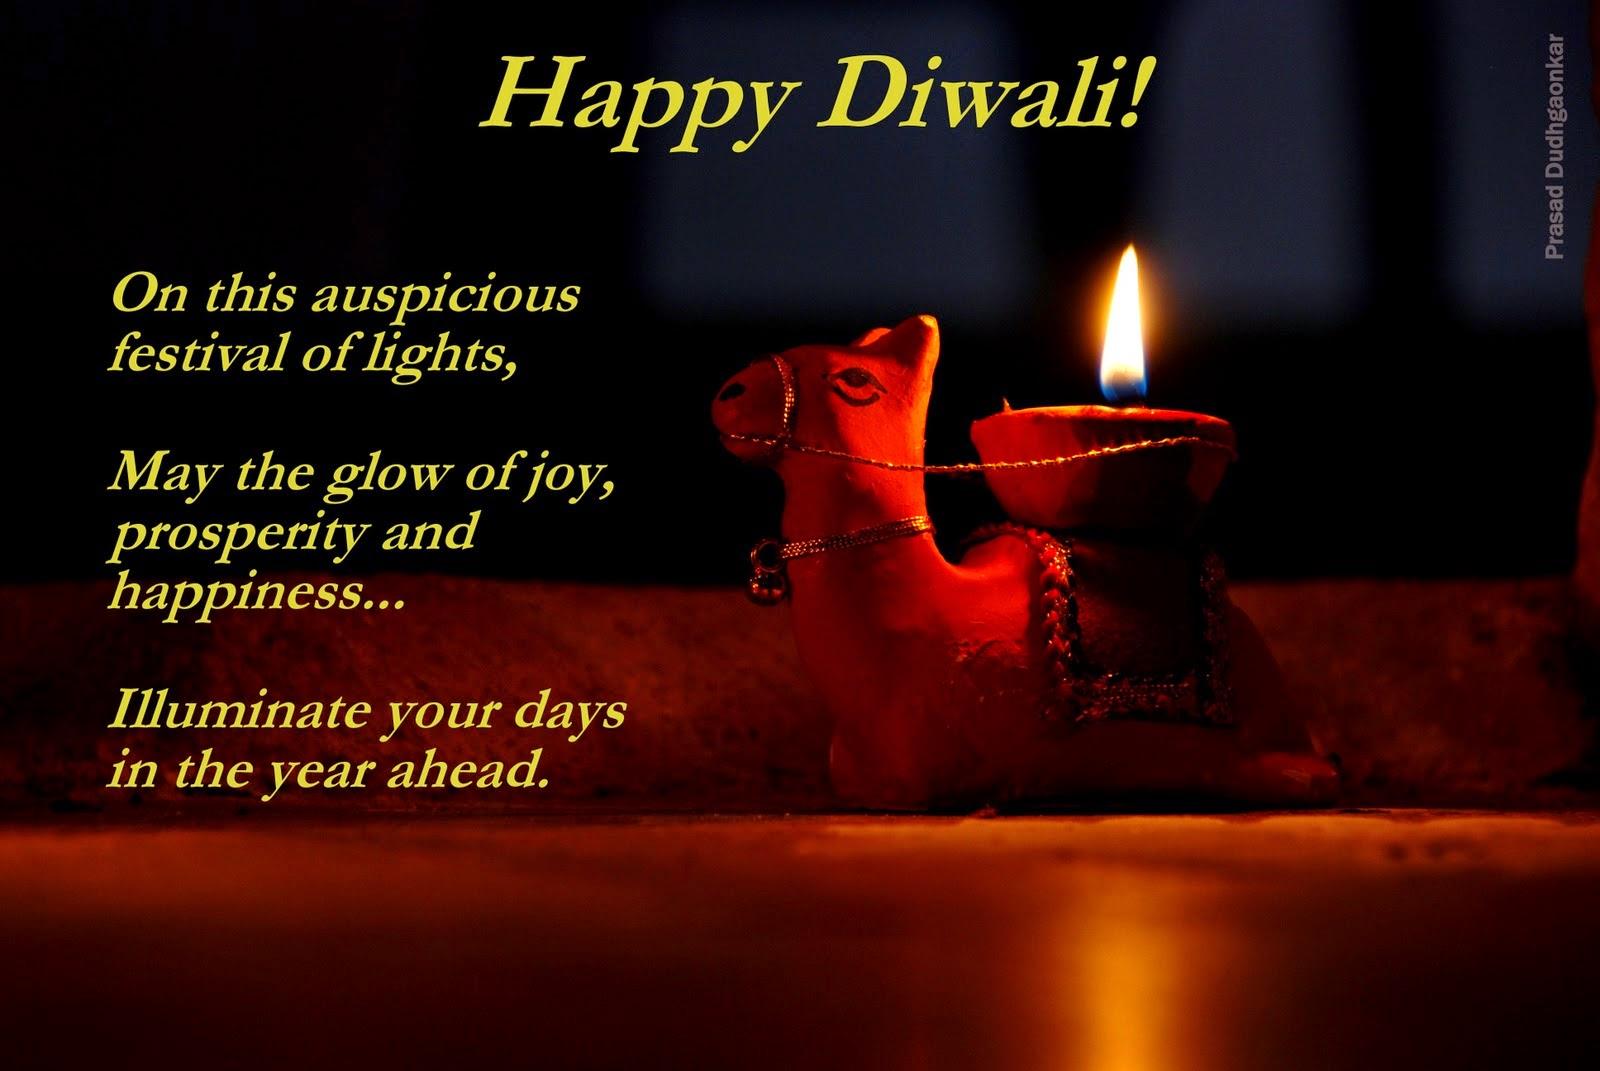 diwali 2014 messages